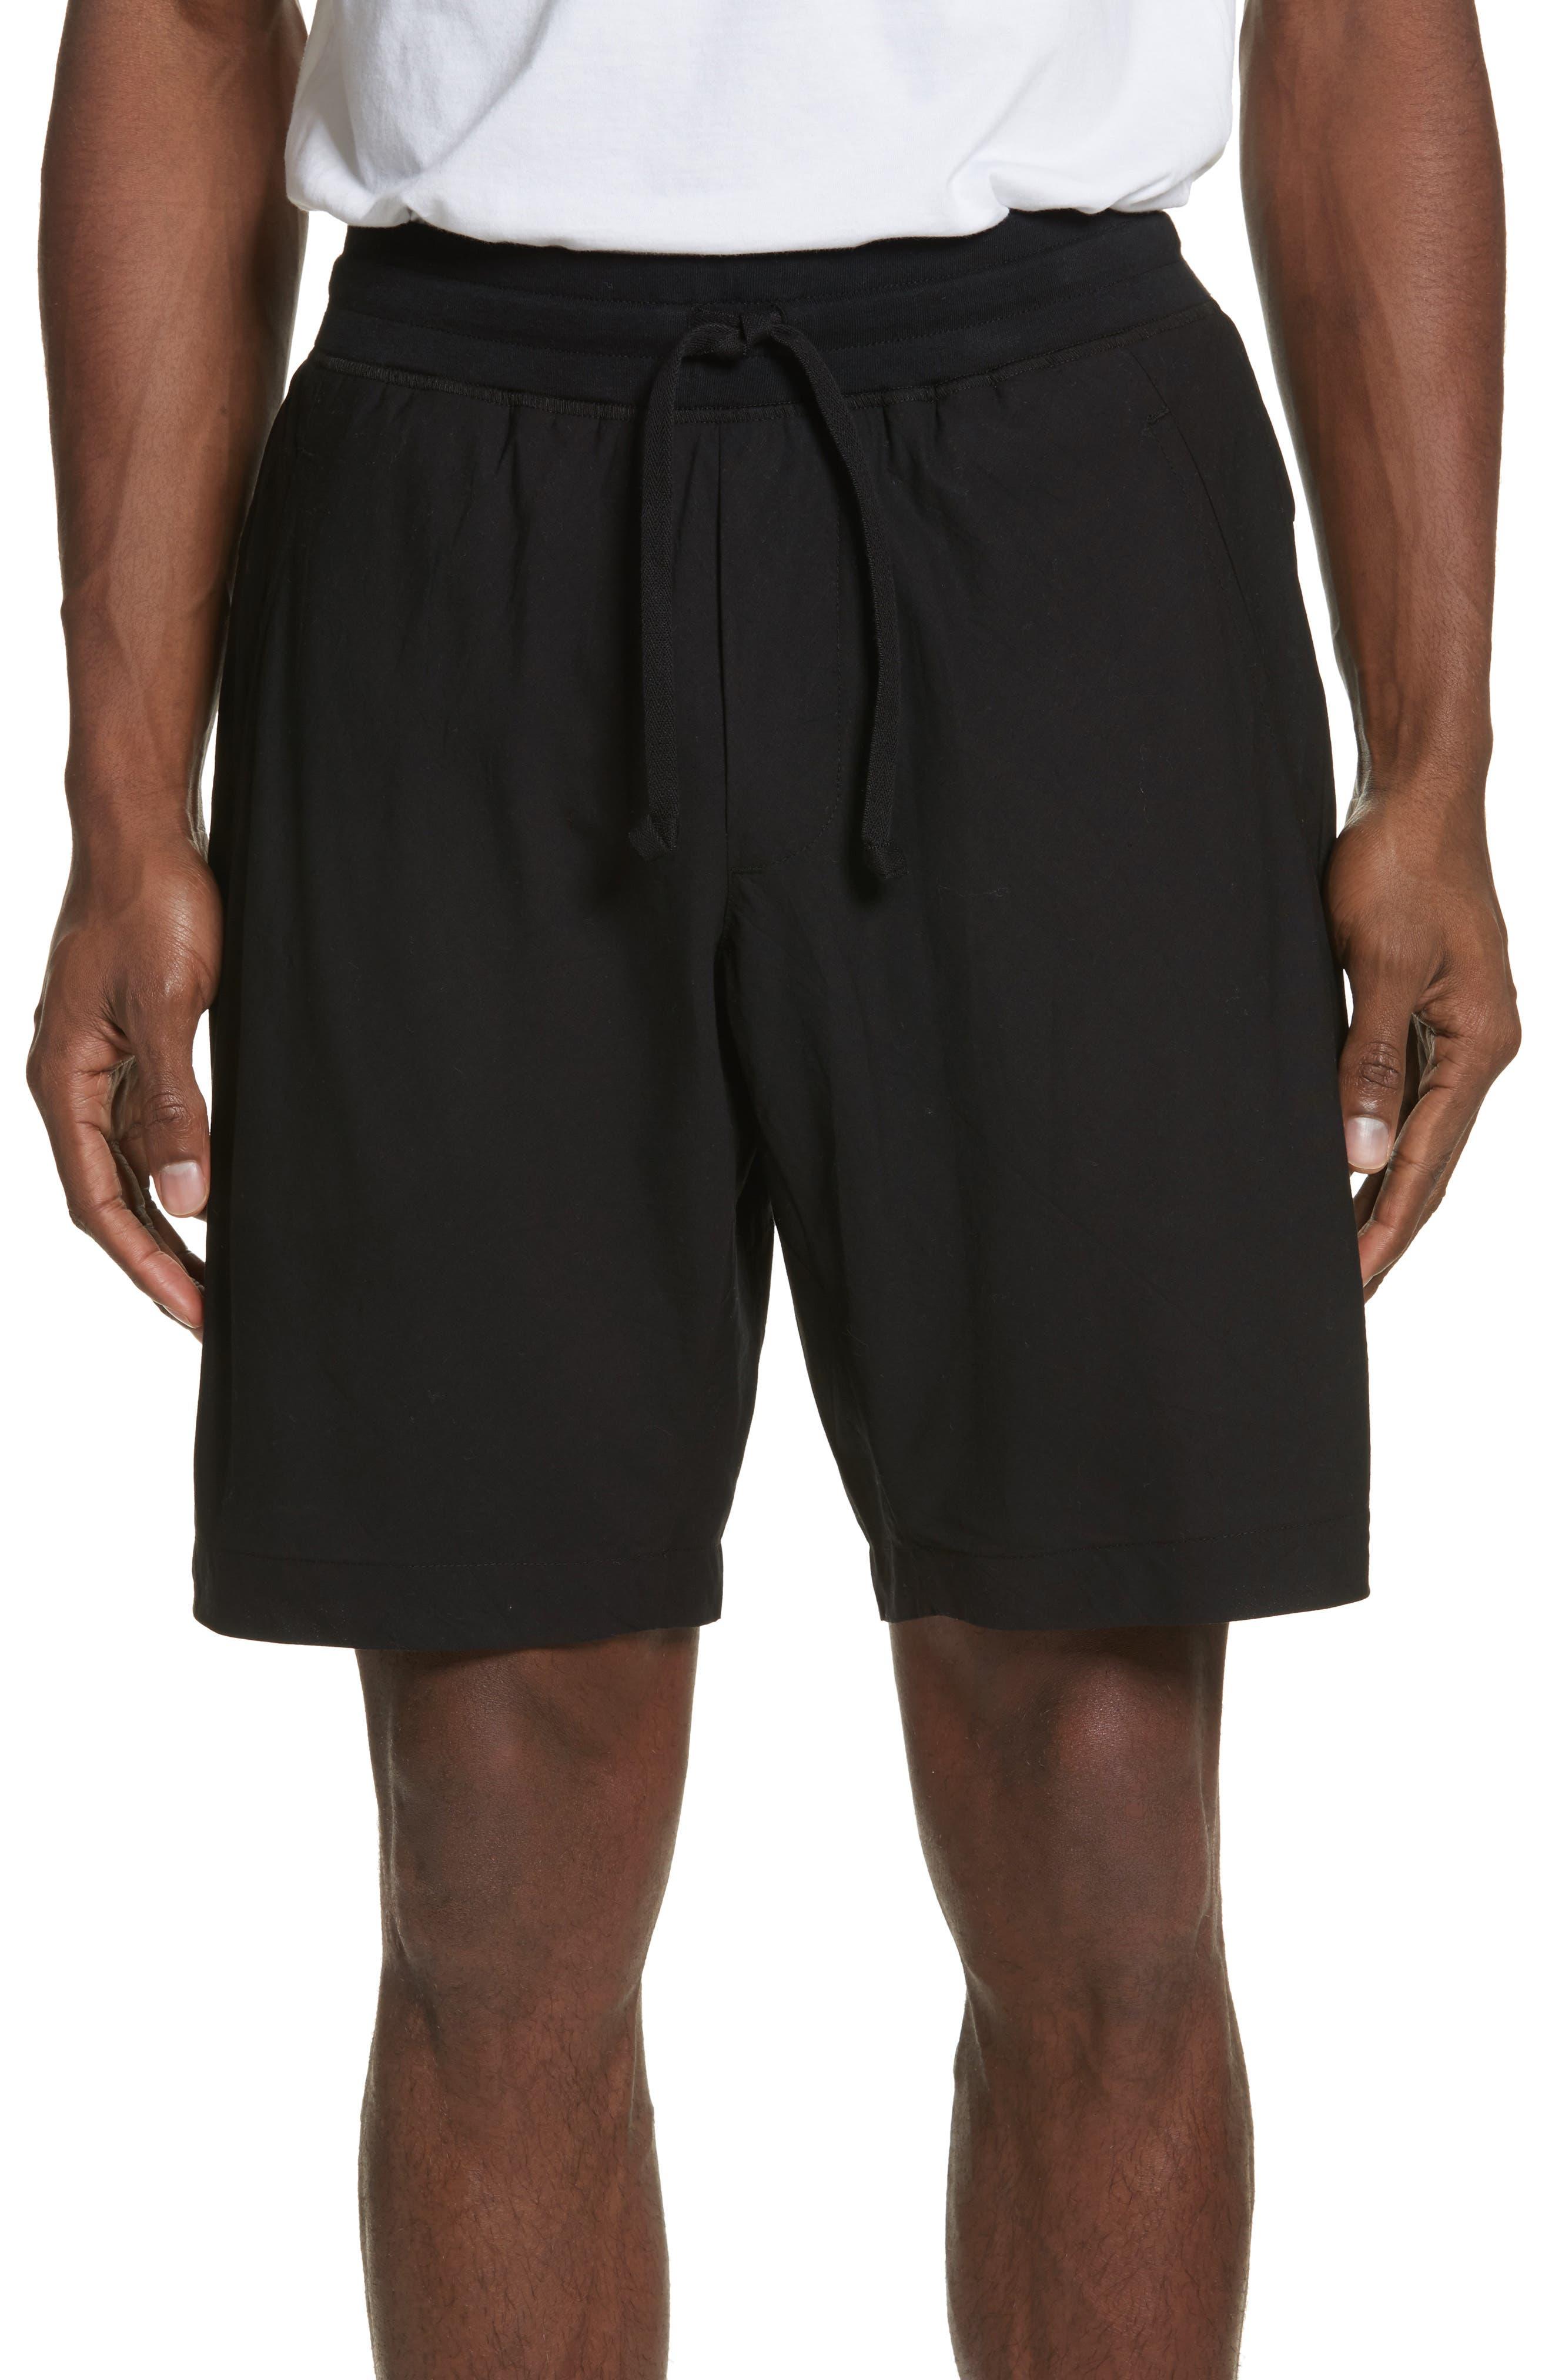 Overlay Shorts,                         Main,                         color, Black